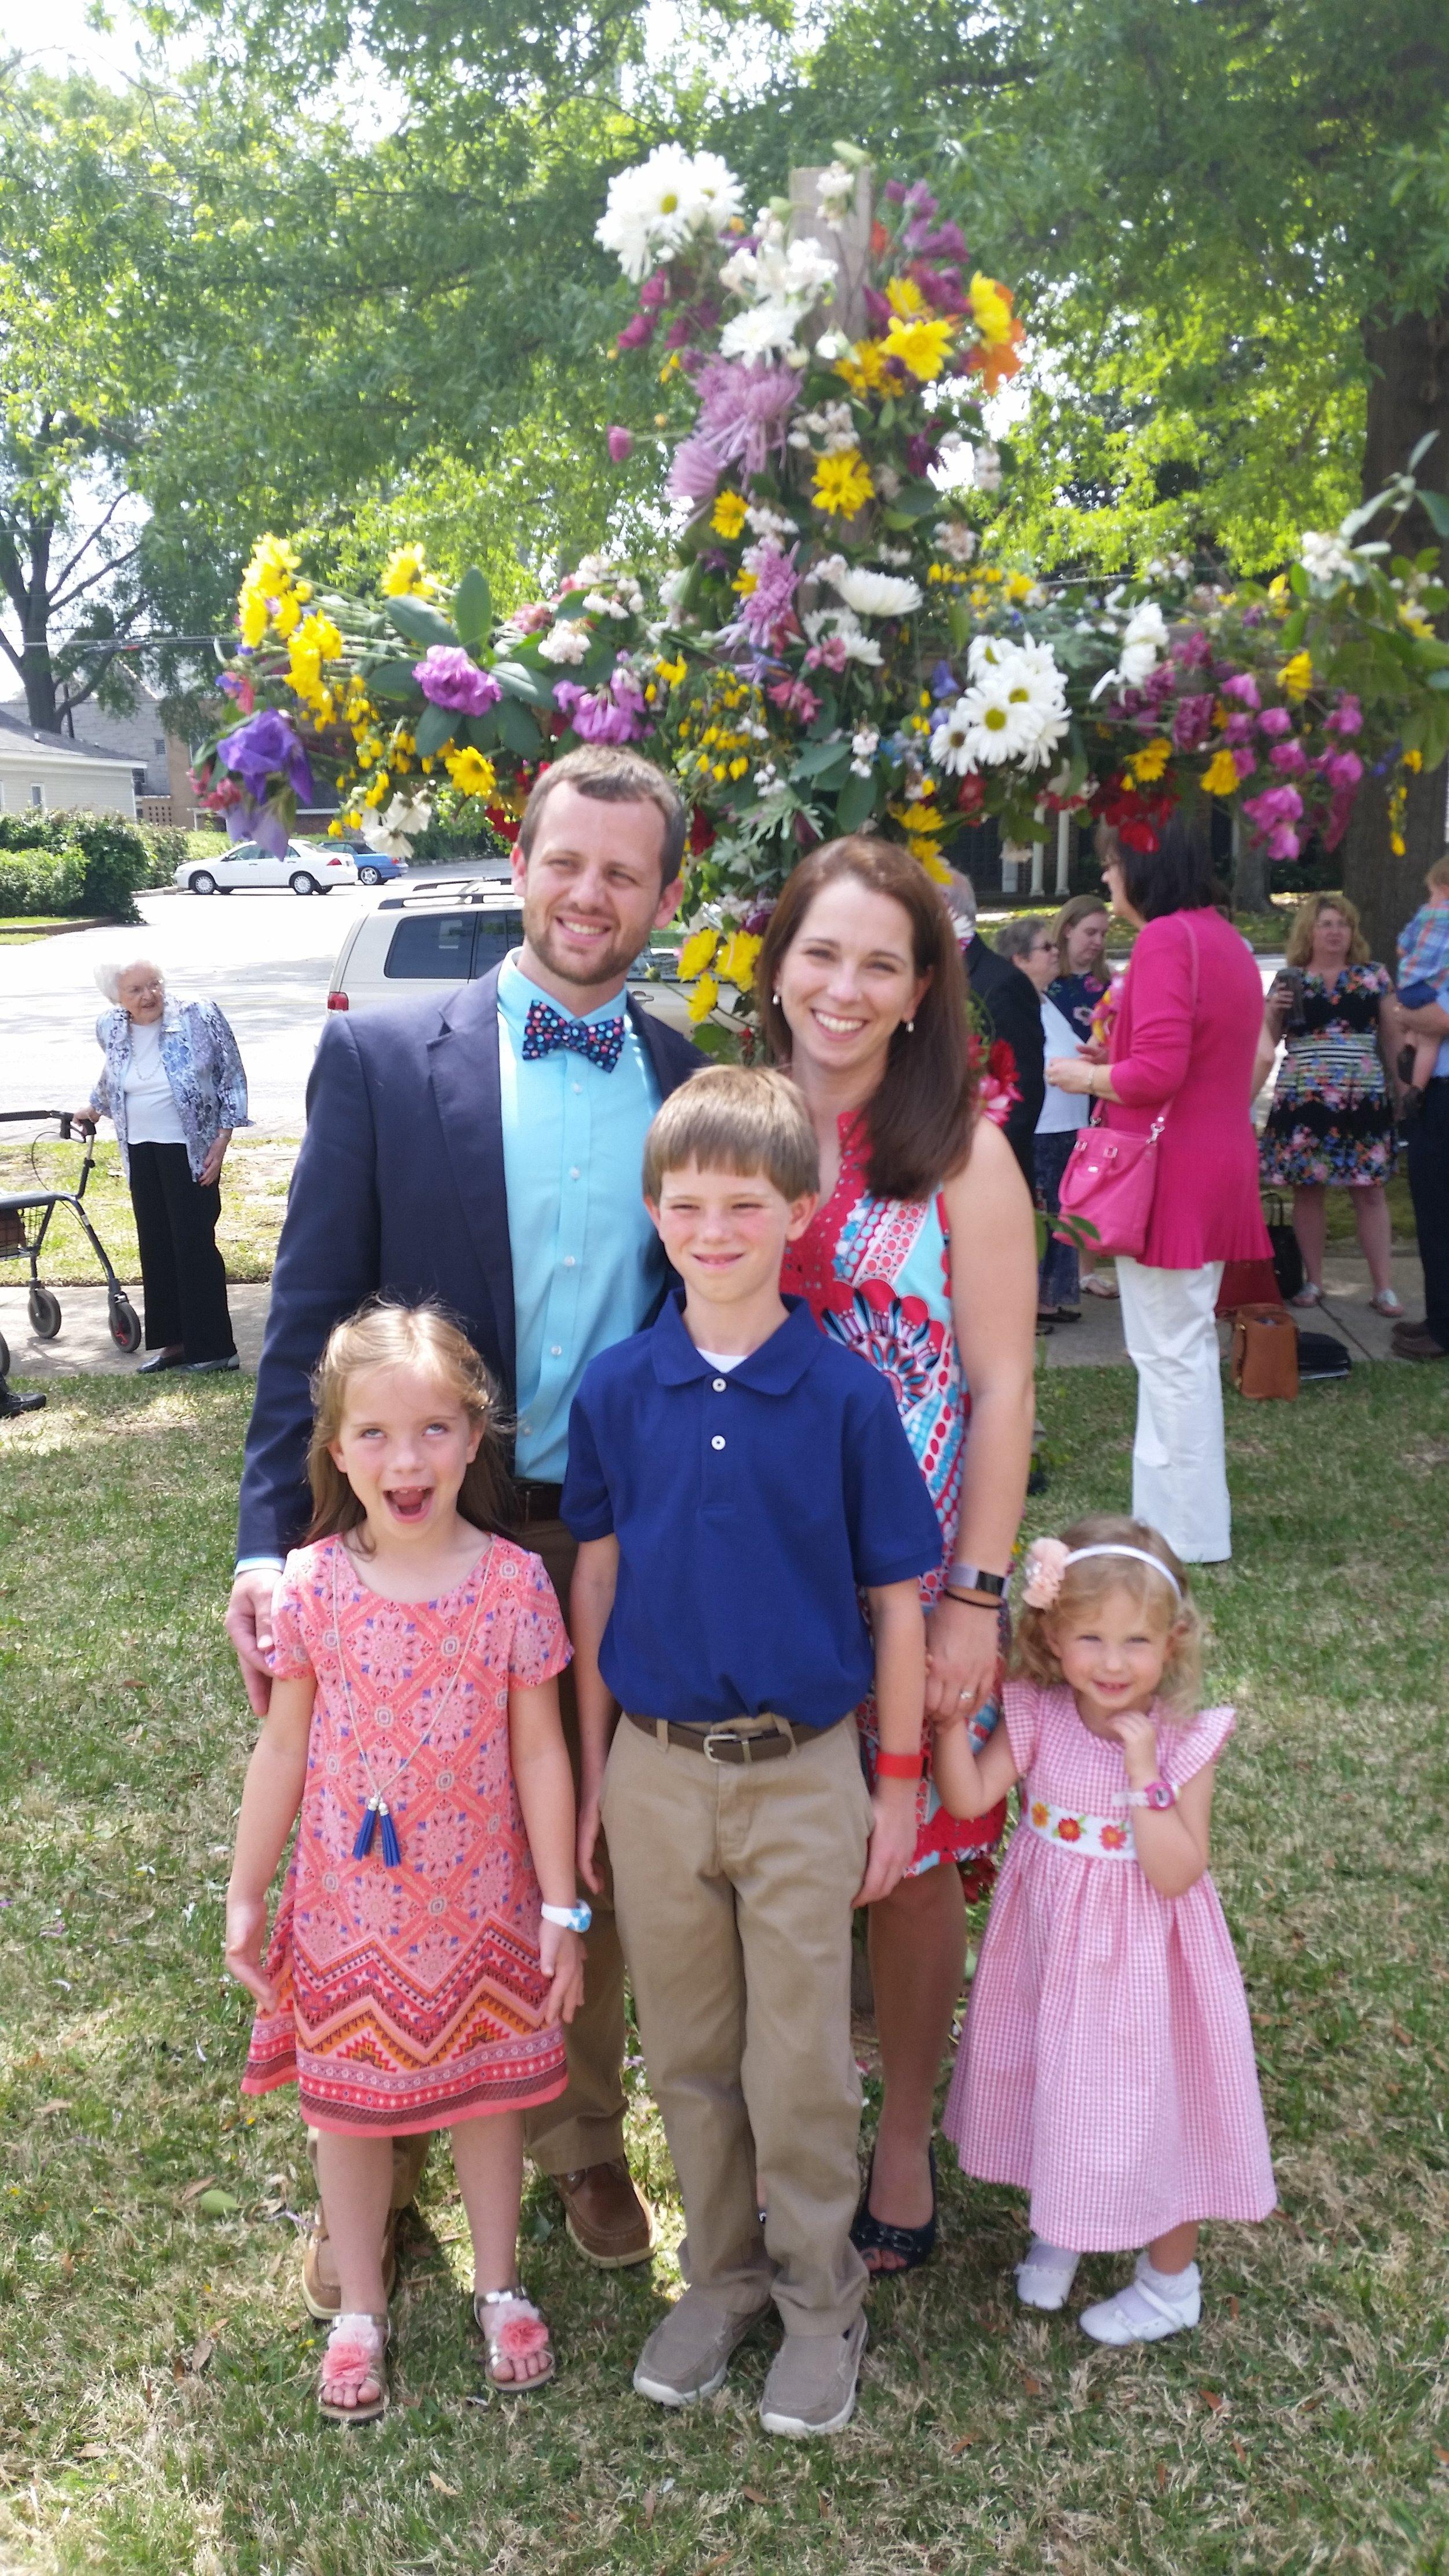 Hanes, Brady & Rachel. Porter, Evie Grace, Leah